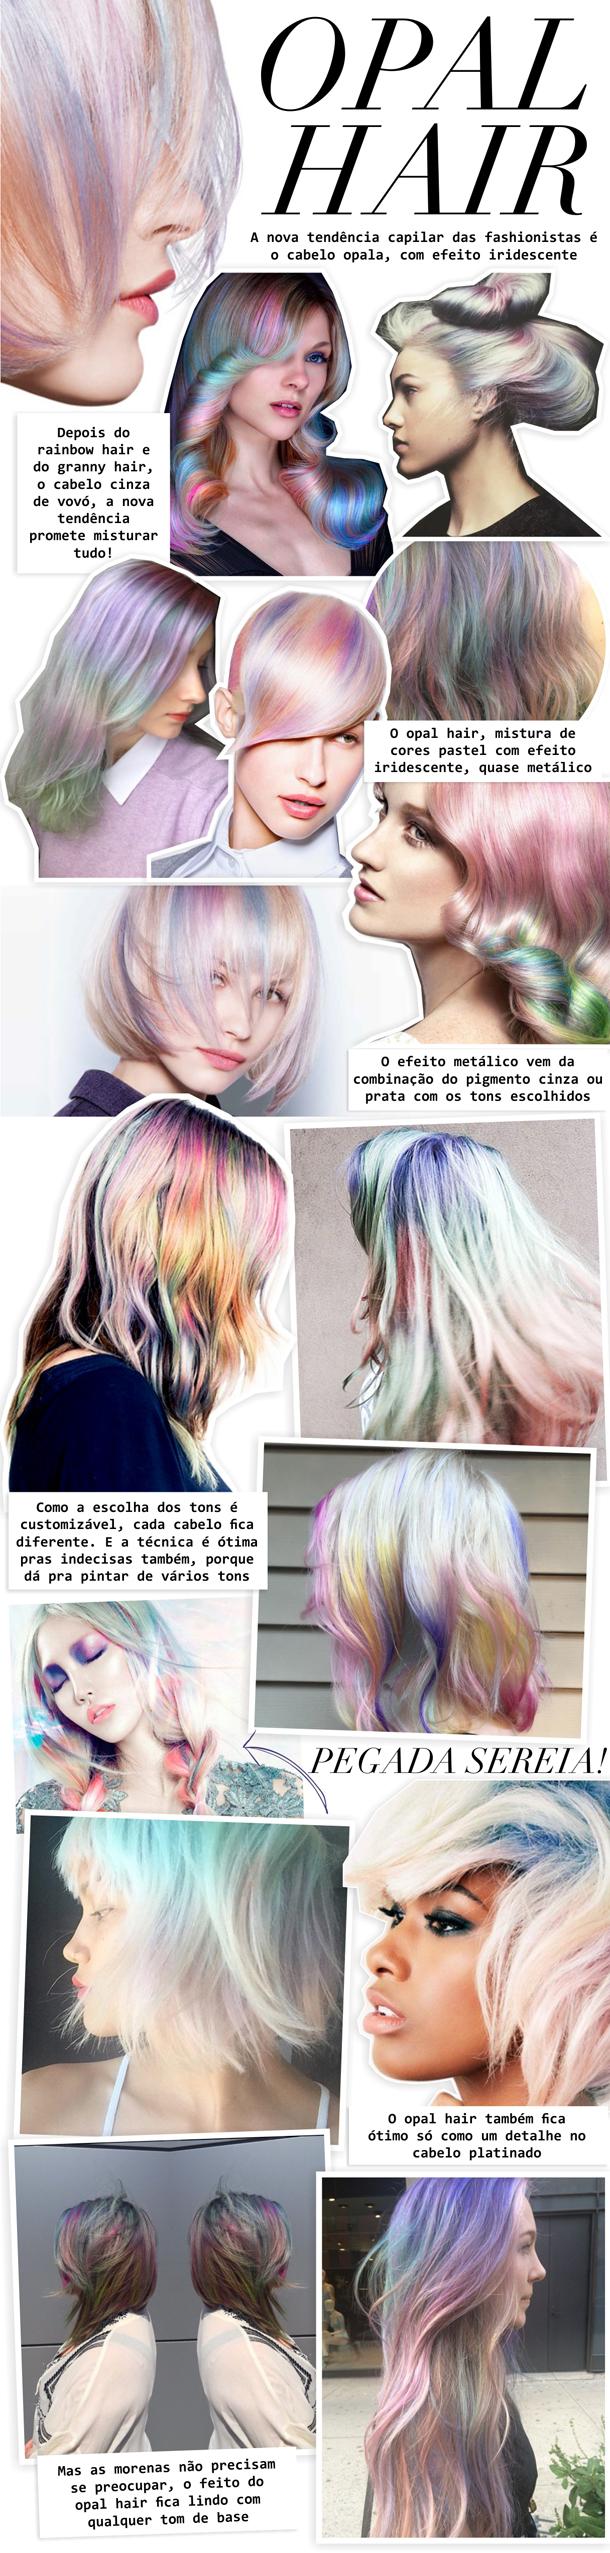 mundo-lolita-cabelos-opal-hair-trend-color